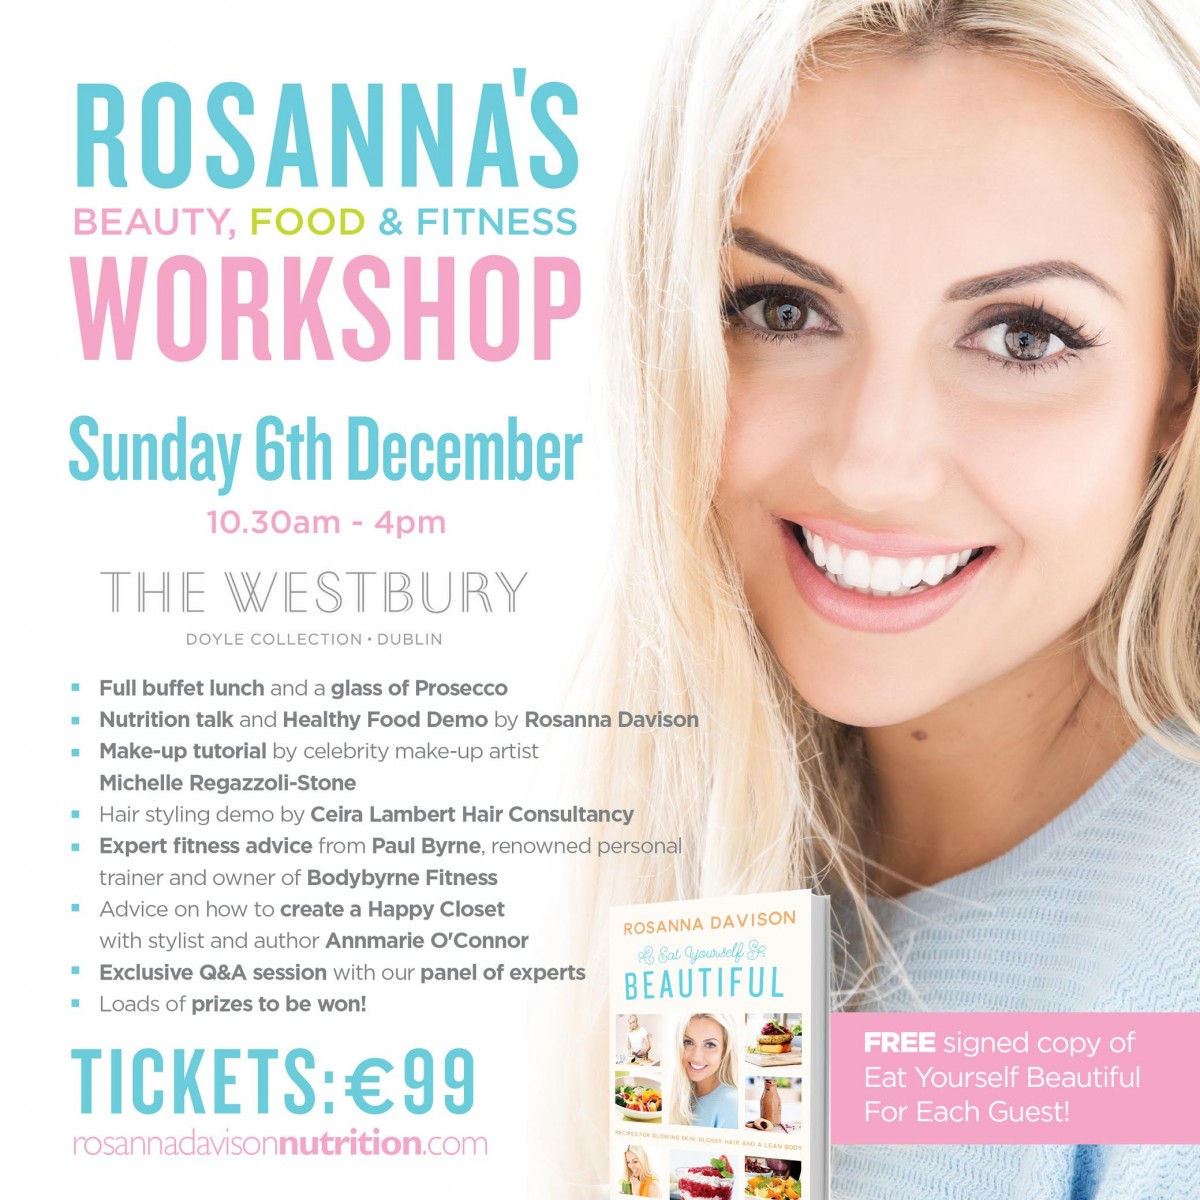 c9a2e2142c Rosanna s Beauty